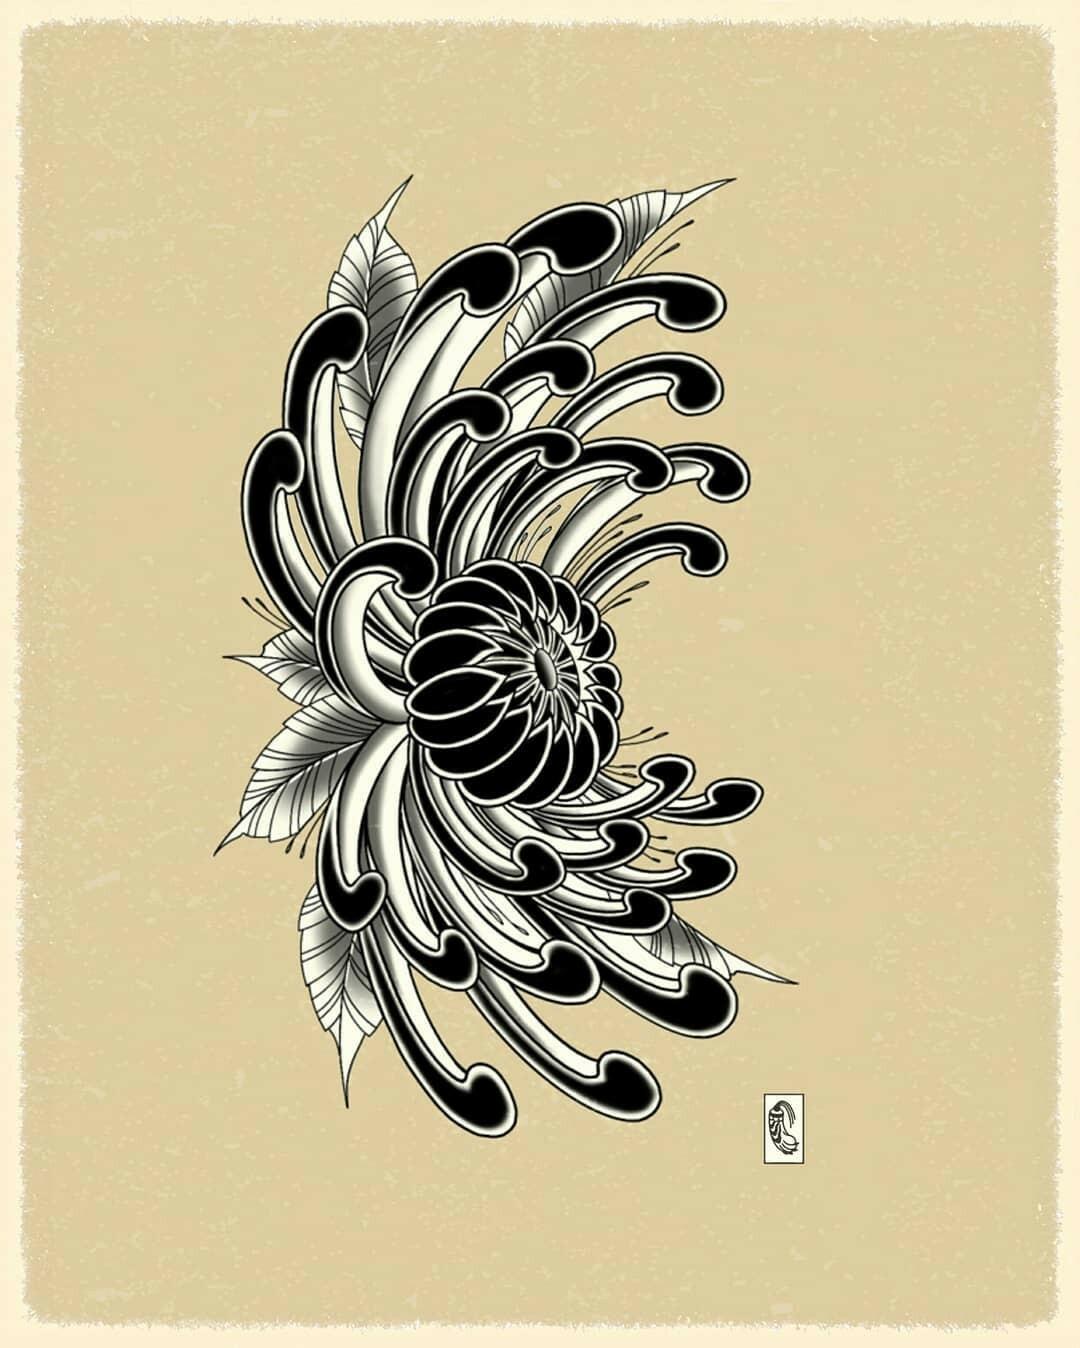 Inksearch tattoo Yura Rys